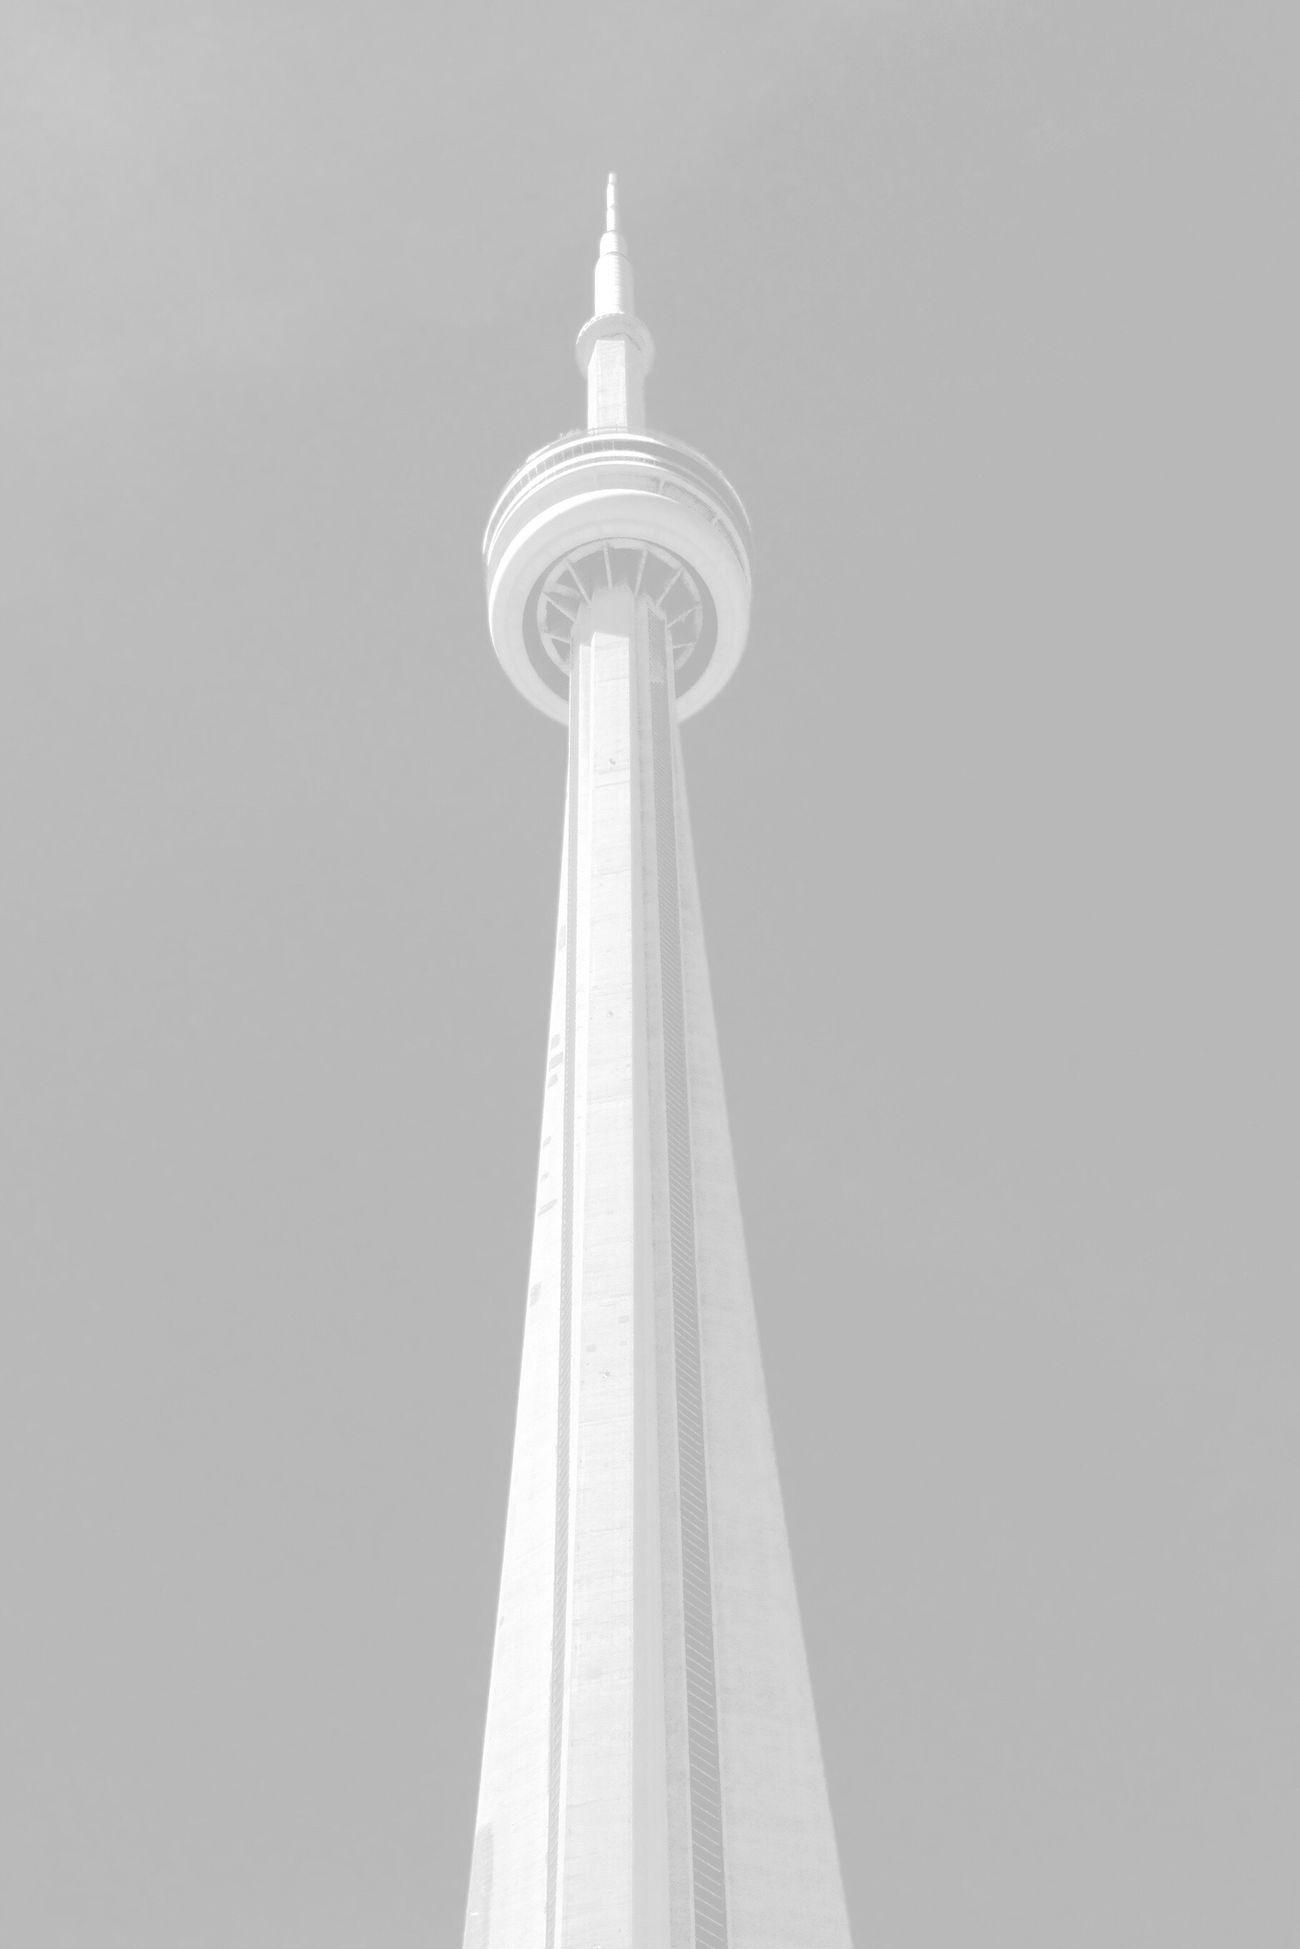 Views from the 6ix CN Tower TTorontoOOntariocCanadacCanada Coast To CoastLLow Angle ViewtTowerbBuilt StructureAArchitecturetTall - HighCCitycCommunicationCClear SkytTravel DestinationsnNo PeopleTTravelbBuilding ExteriortTourismtTelevision TowersSkyoOutdoorsdDaysSkyscraperaAbstractVViews